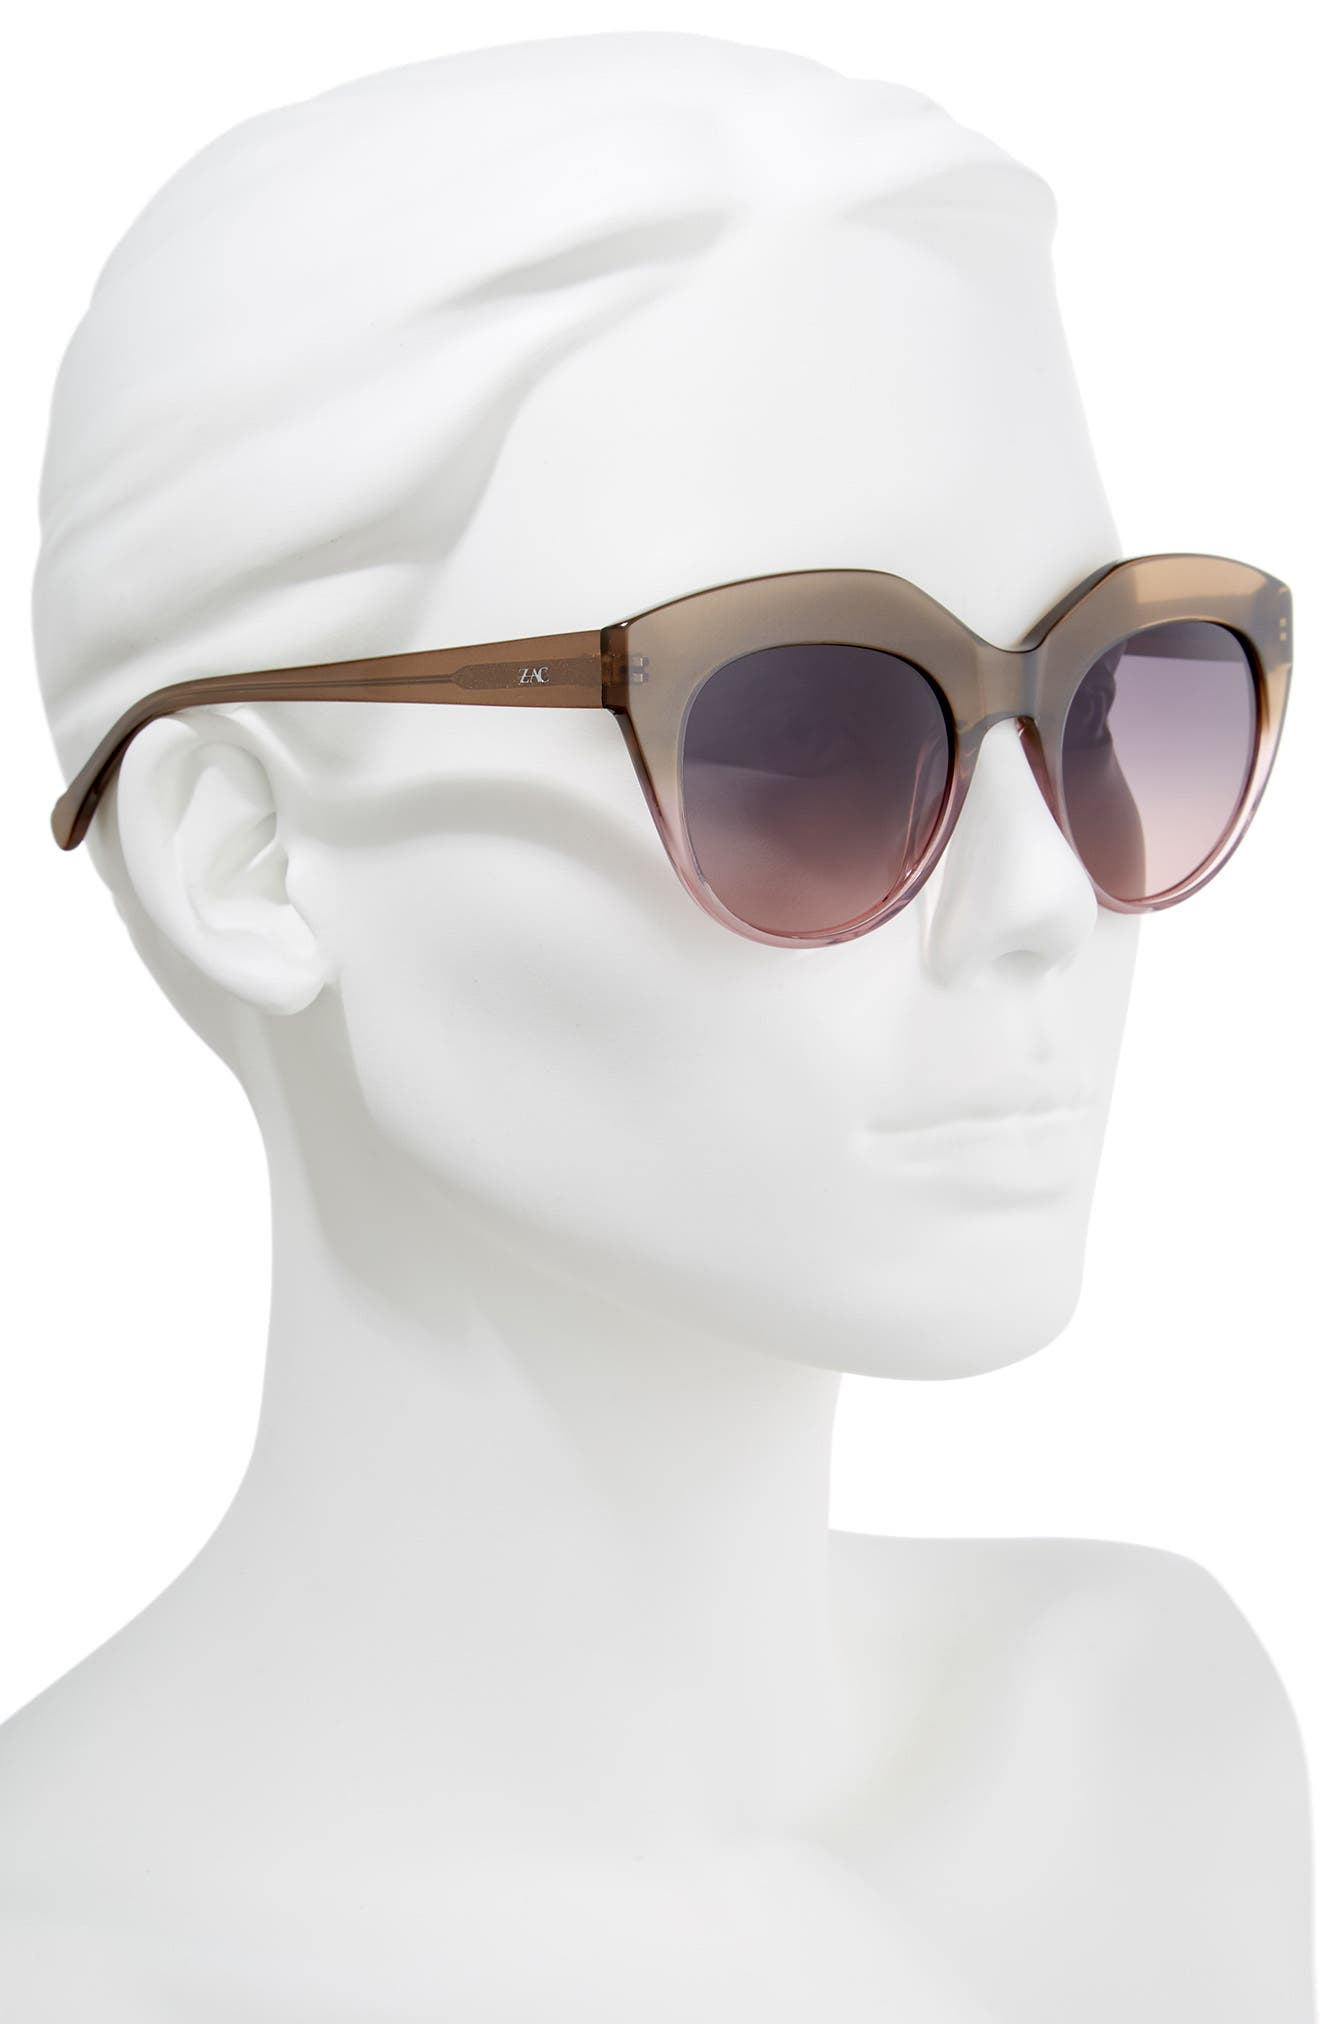 Tamika 53mm Polarized Sunglasses,                             Alternate thumbnail 2, color,                             Dessert/ Berry